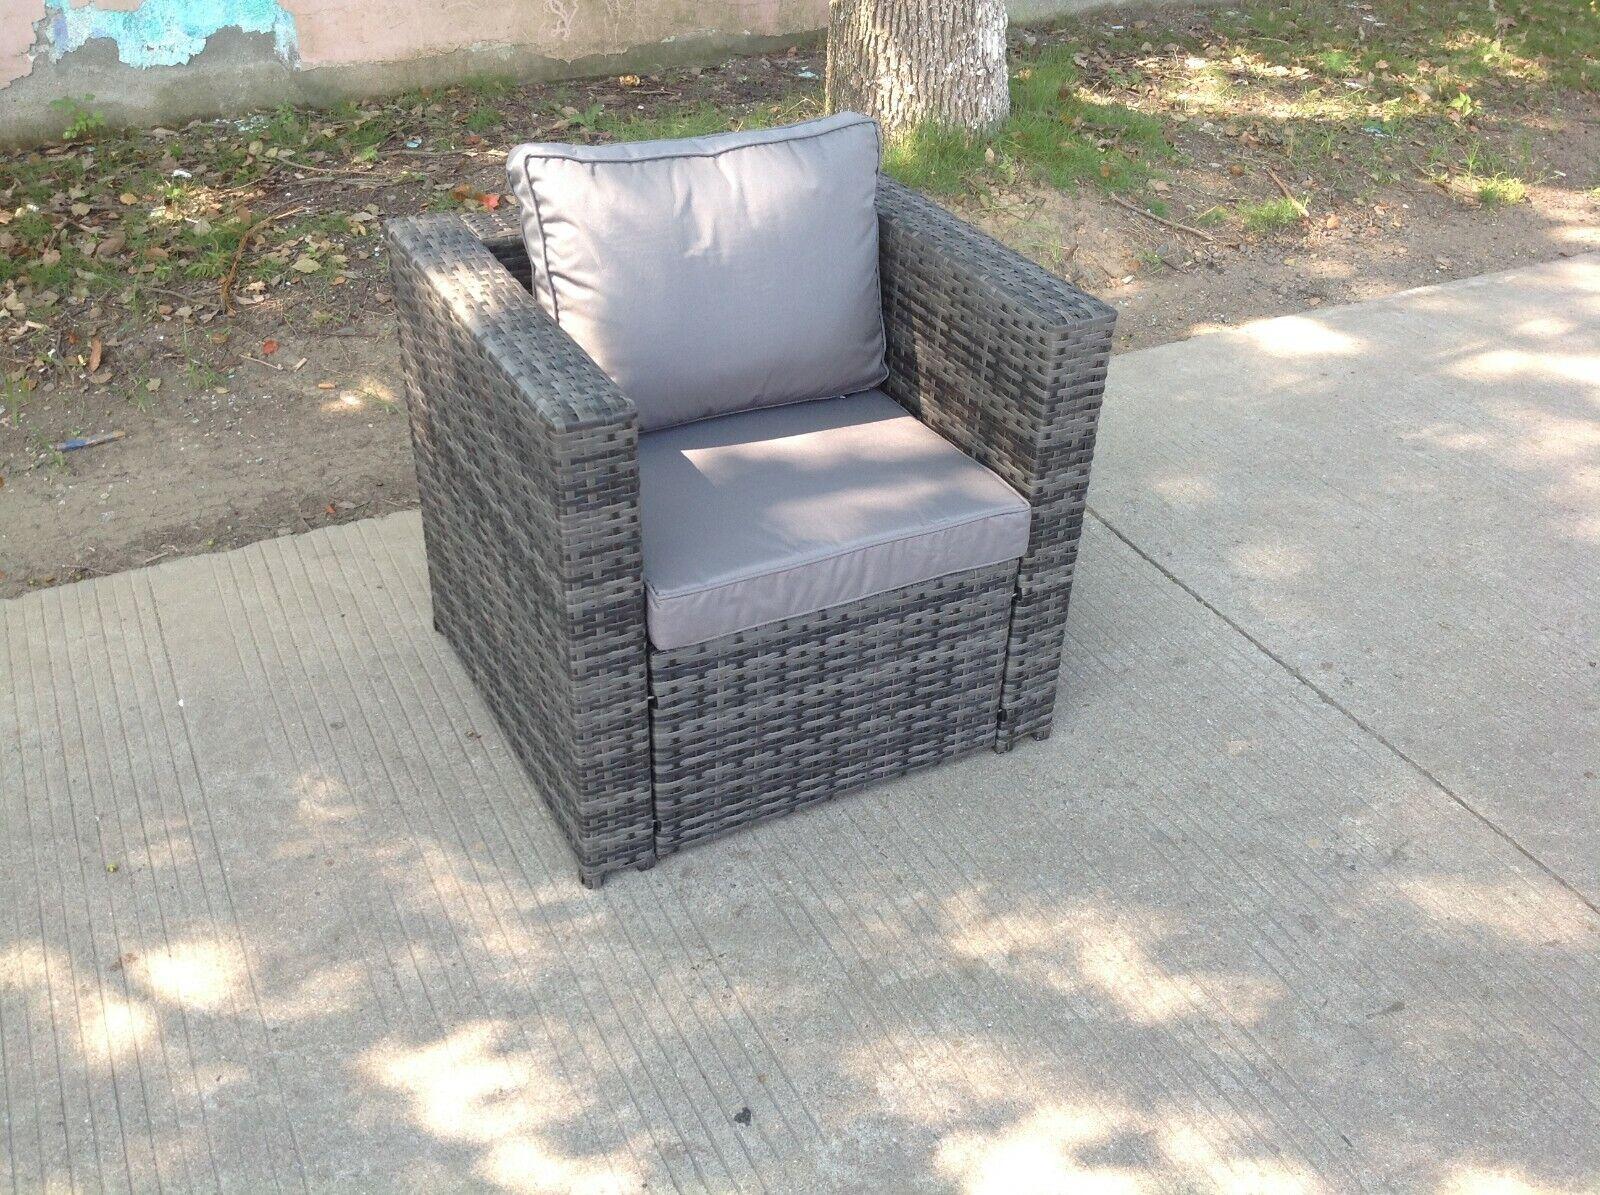 Garden Furniture - rattan single sofa chair patio outdoor garden furniture sofa set with cushion